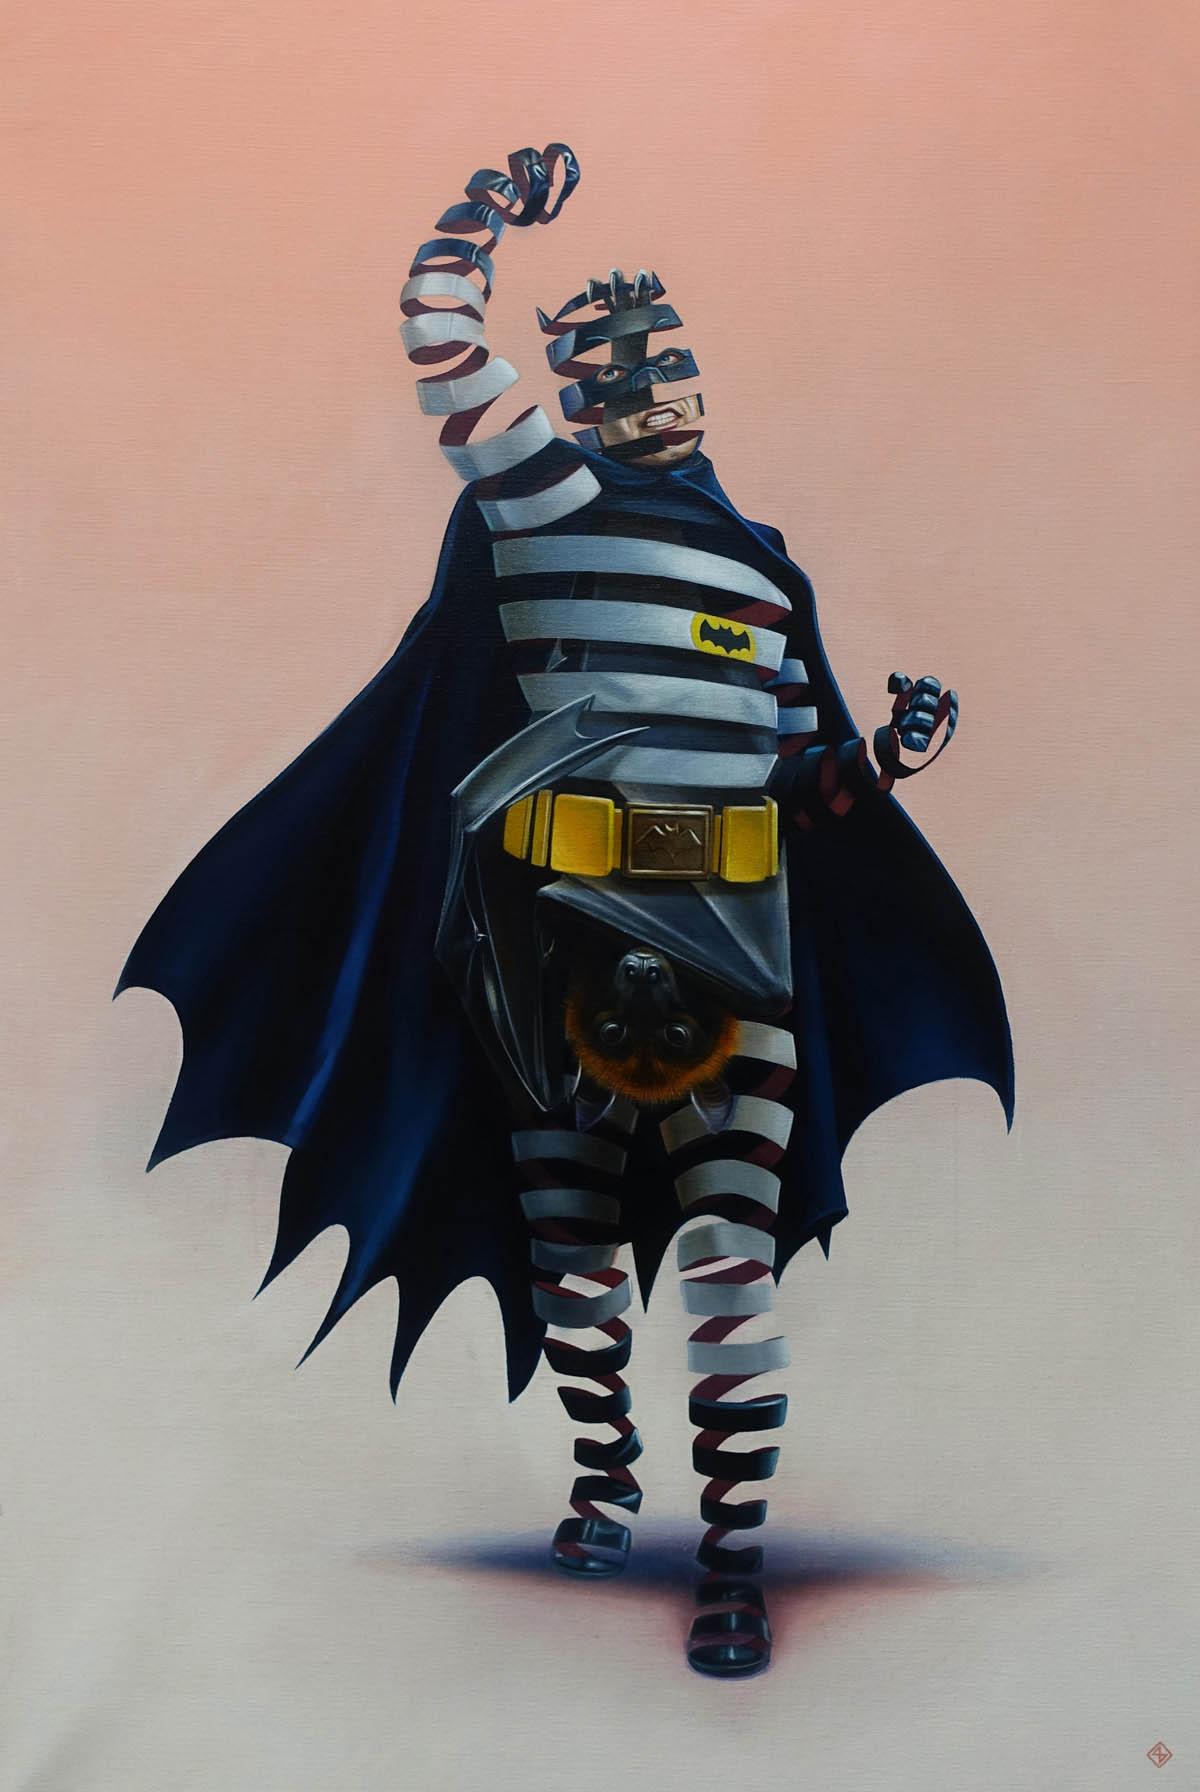 creative surreal paintings ideas batman by stefan thelen